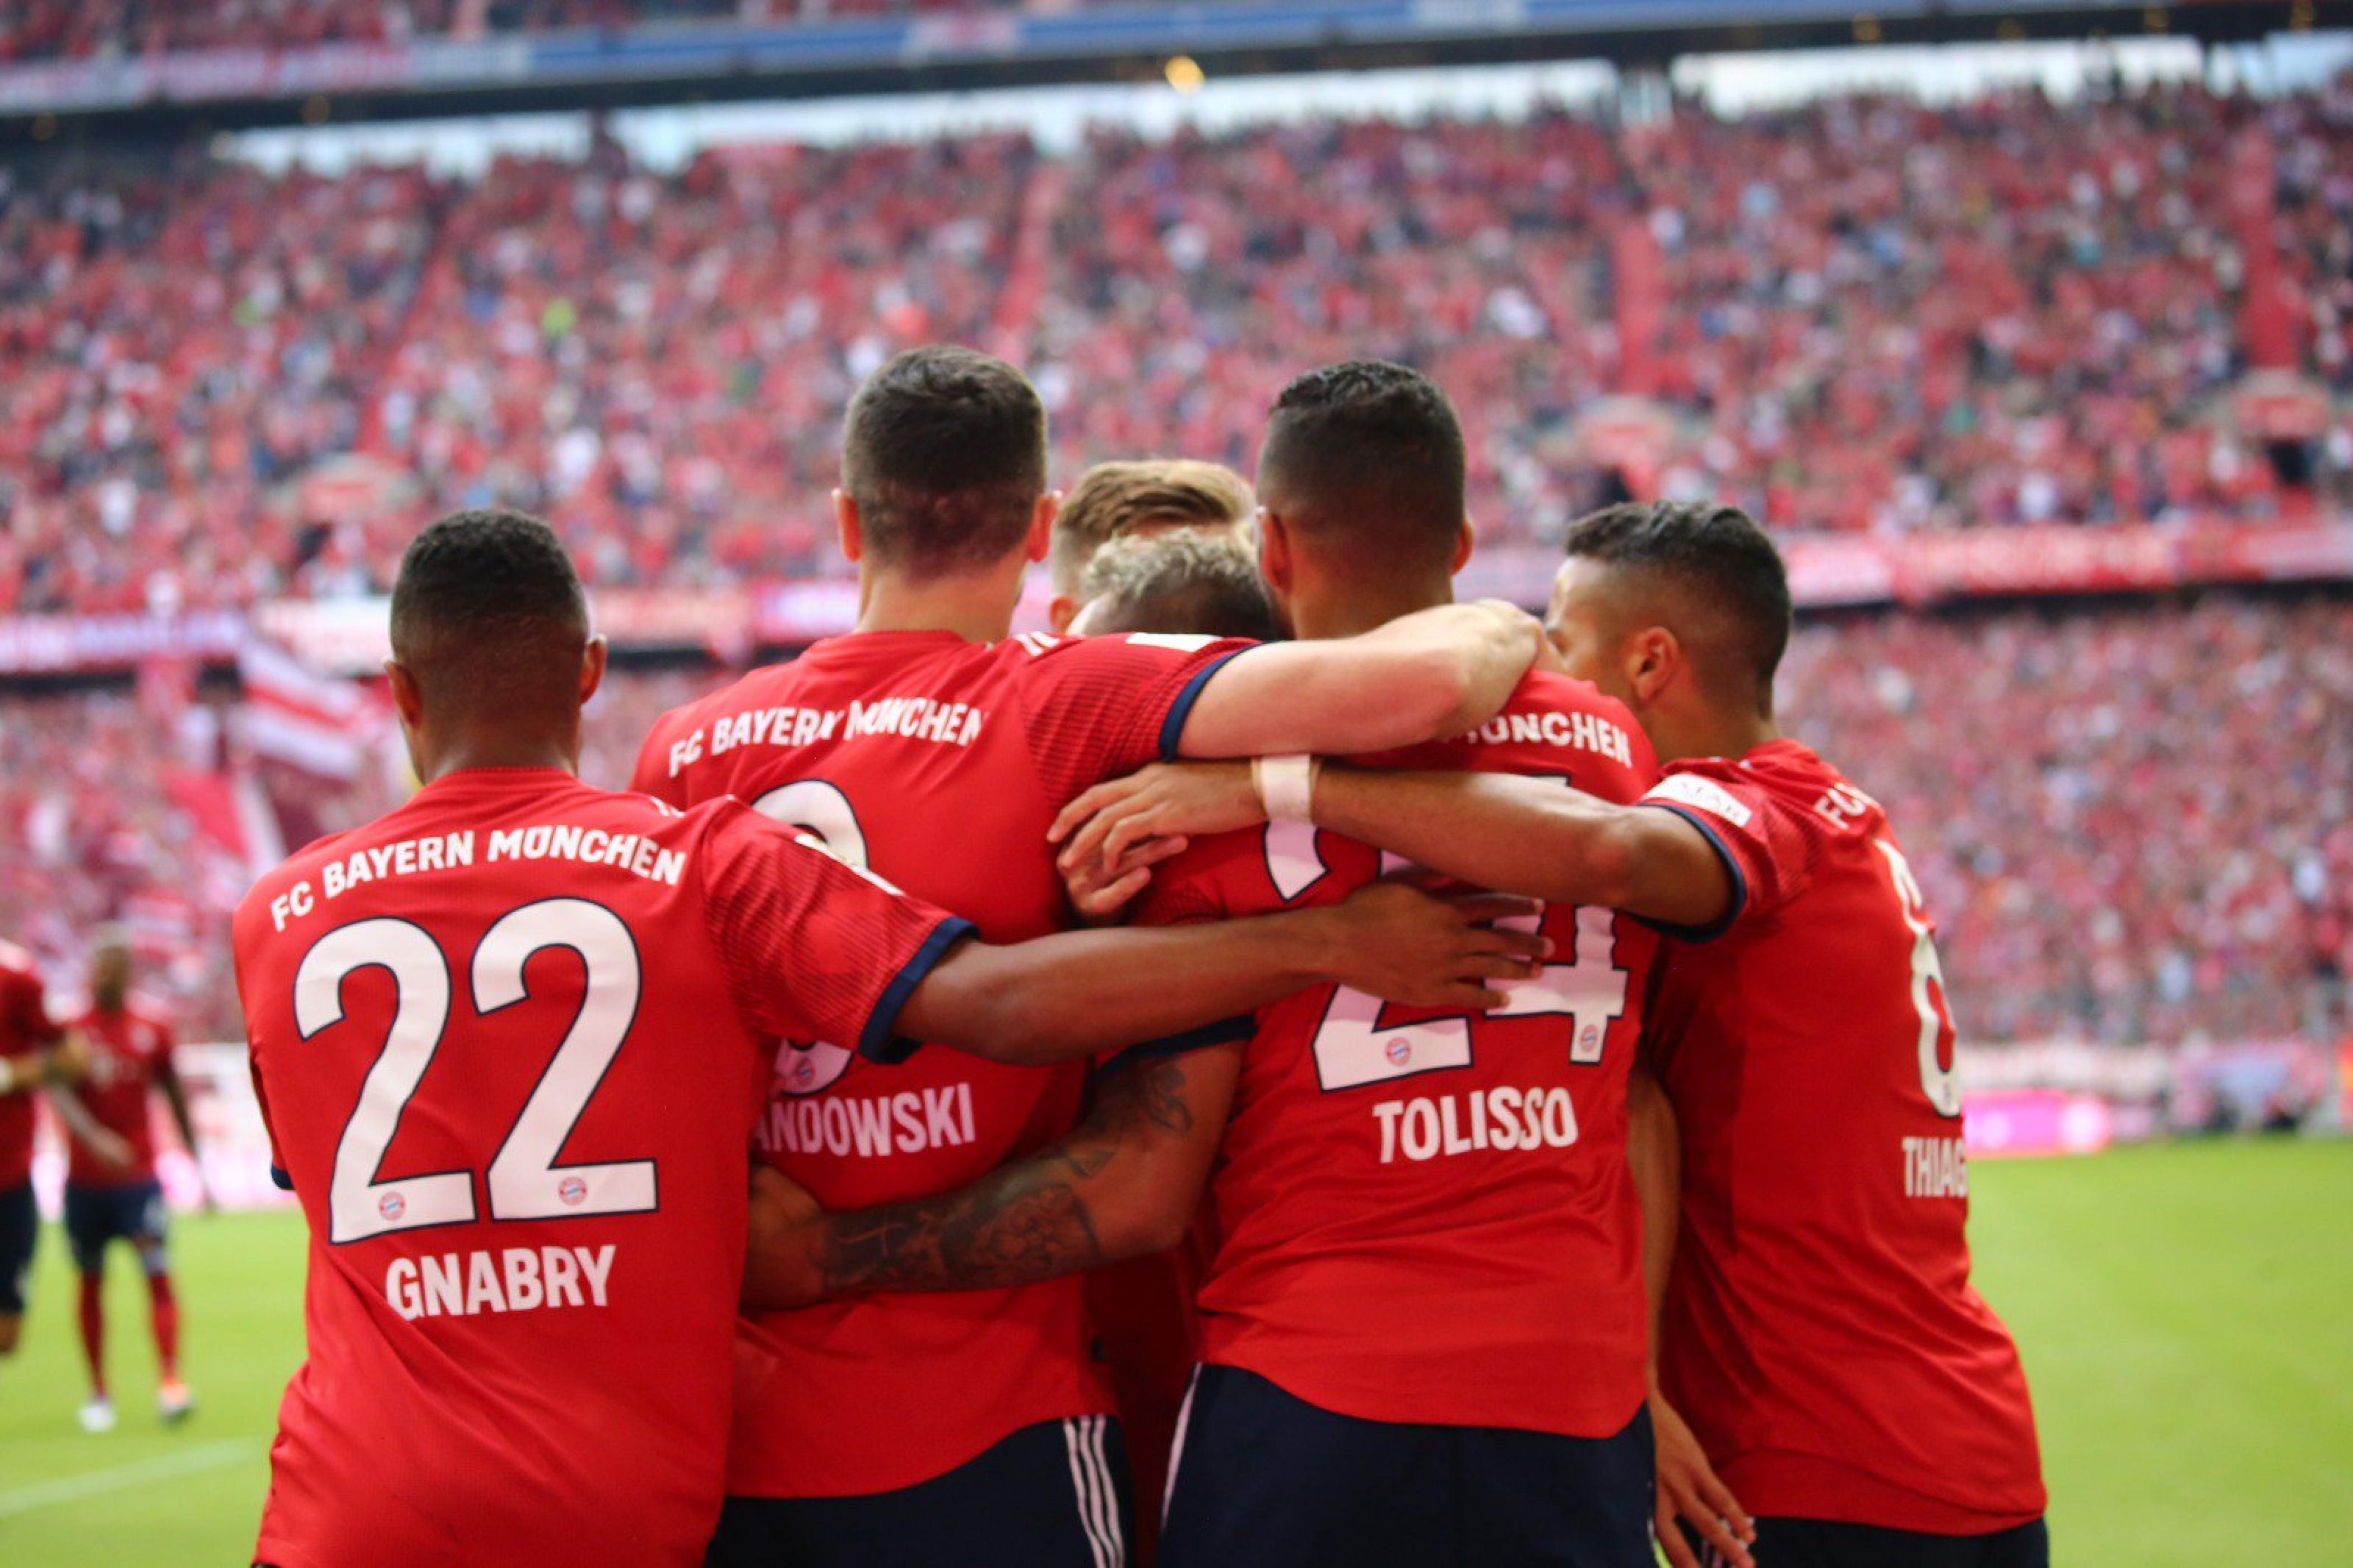 Bundesliga - Wendell spaventa il Bayern, ma il Bayer poi viene travolto: 3-1 all'Allianz Arena